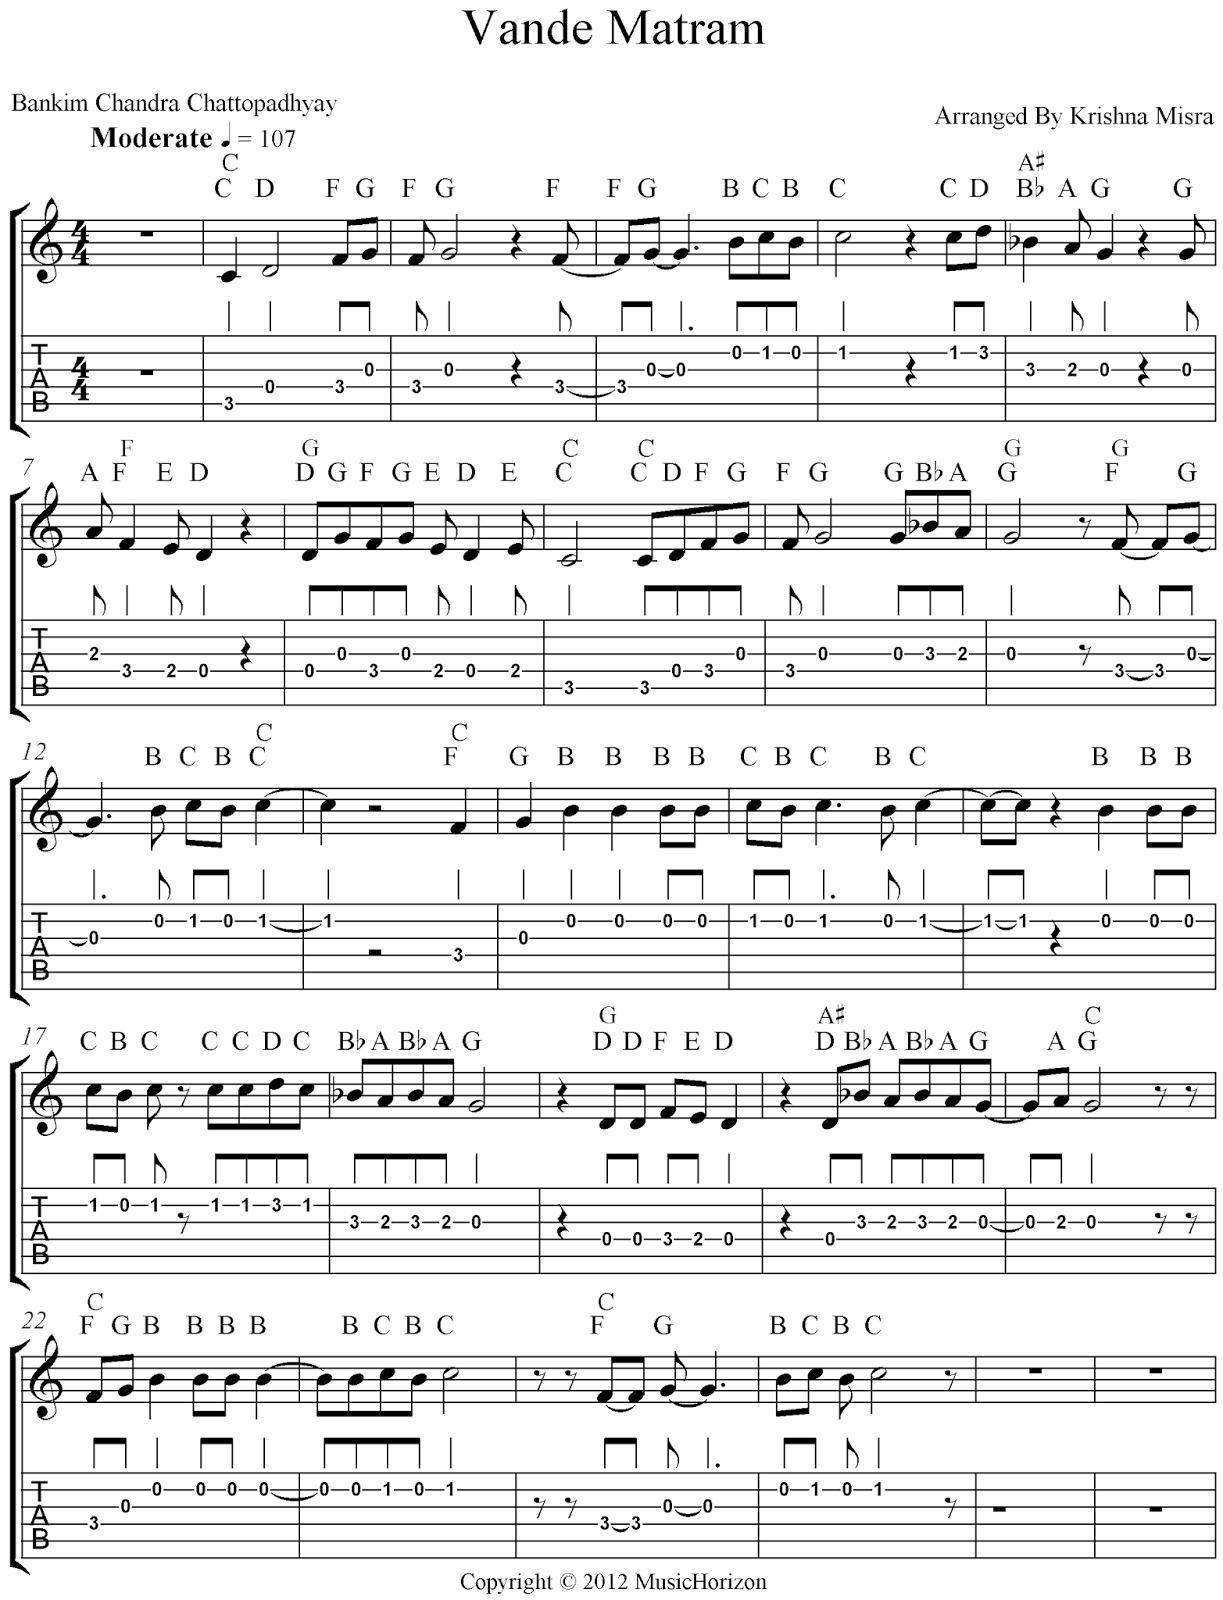 Vande Mataram Piano Notes